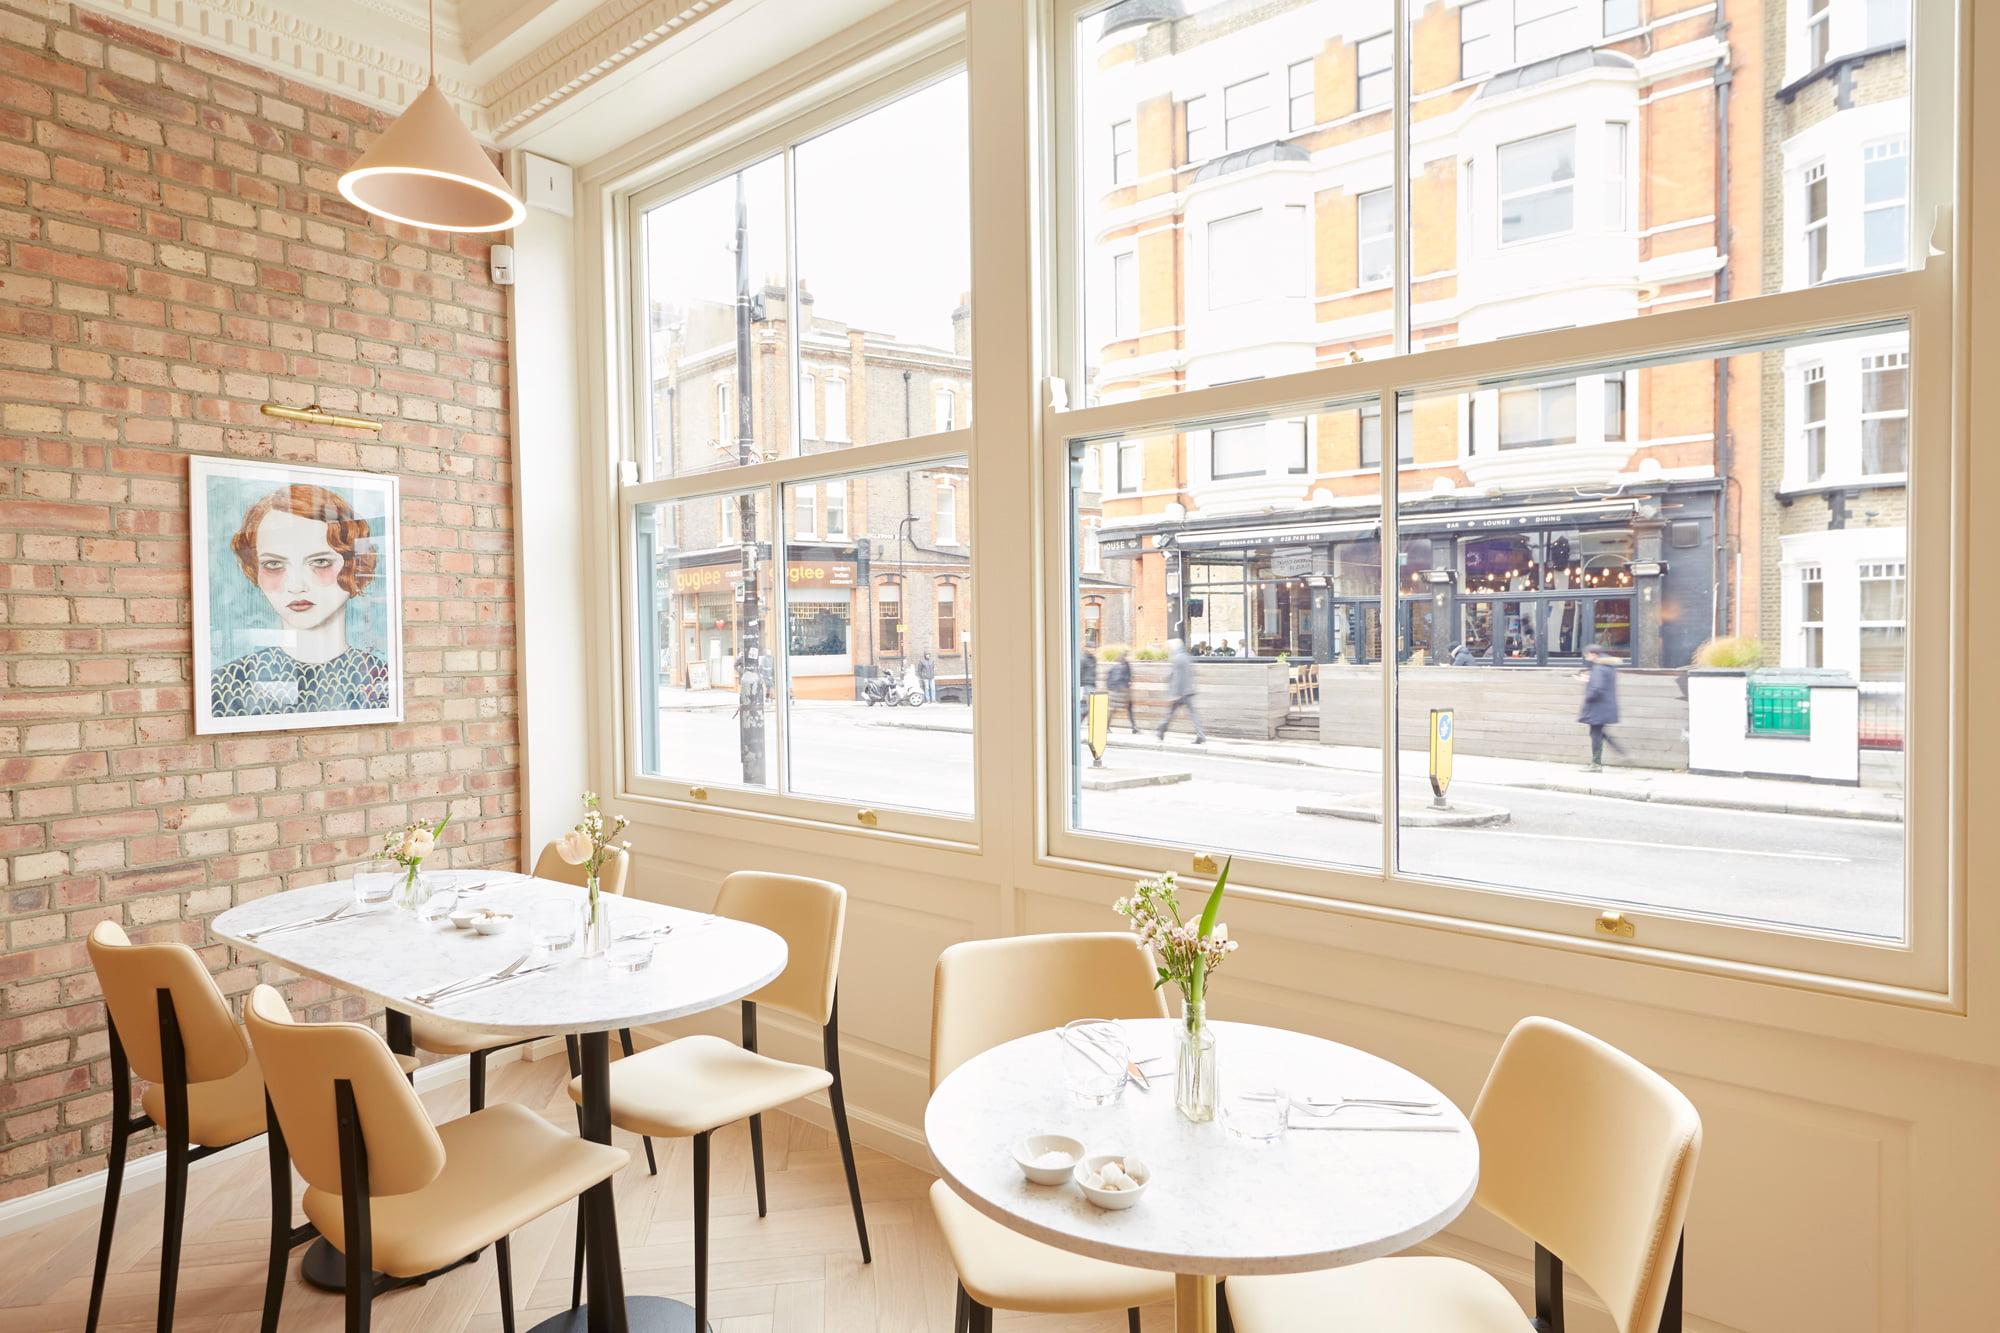 ham best restaurants north london neighbourhoods